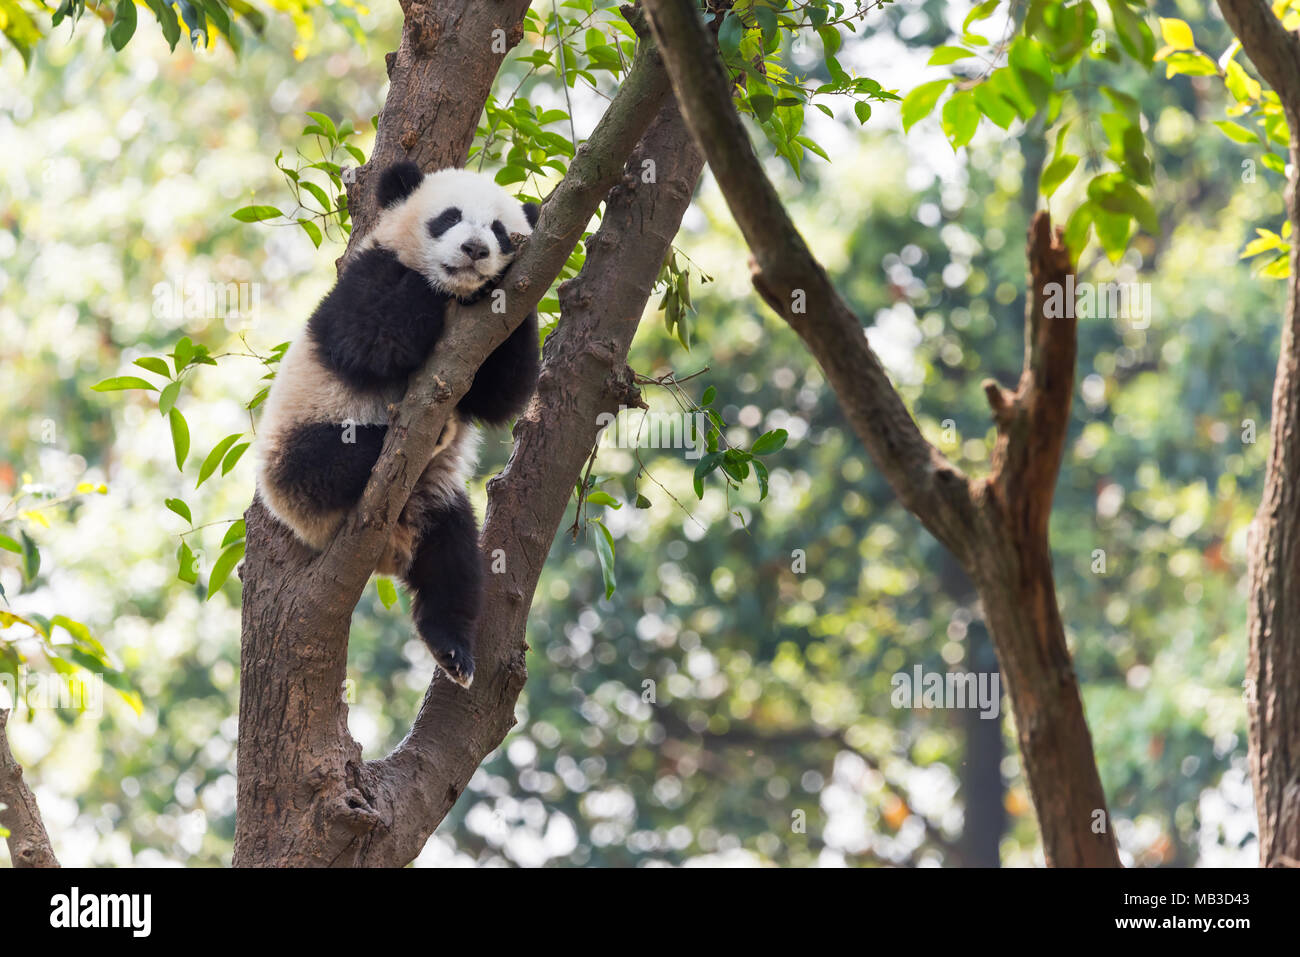 Panda cub sleeping in a tree, Chengdu, China - Stock Image